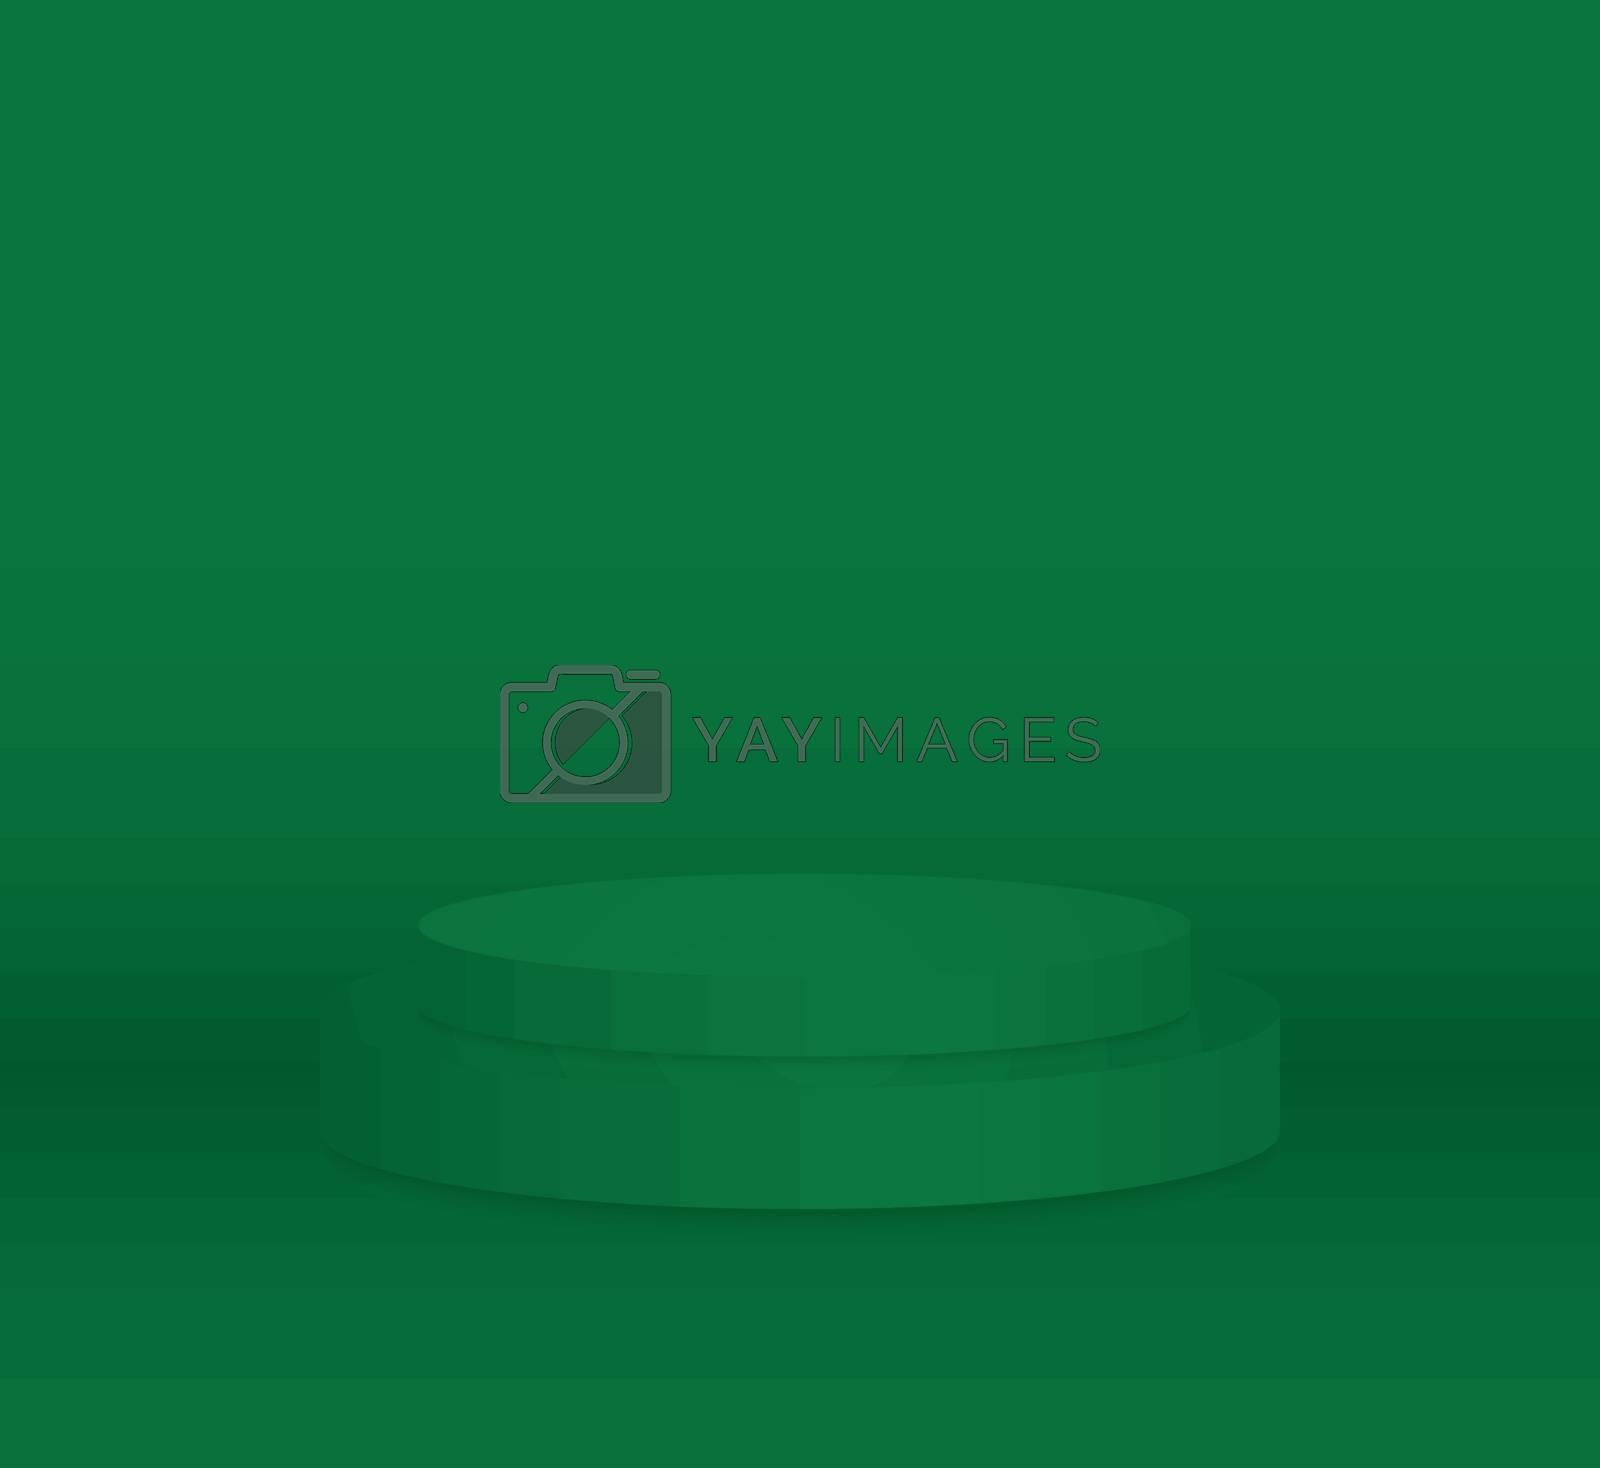 3d green cylinder podium minimal studio background. Abstract 3d geometric shape object illustration render Display